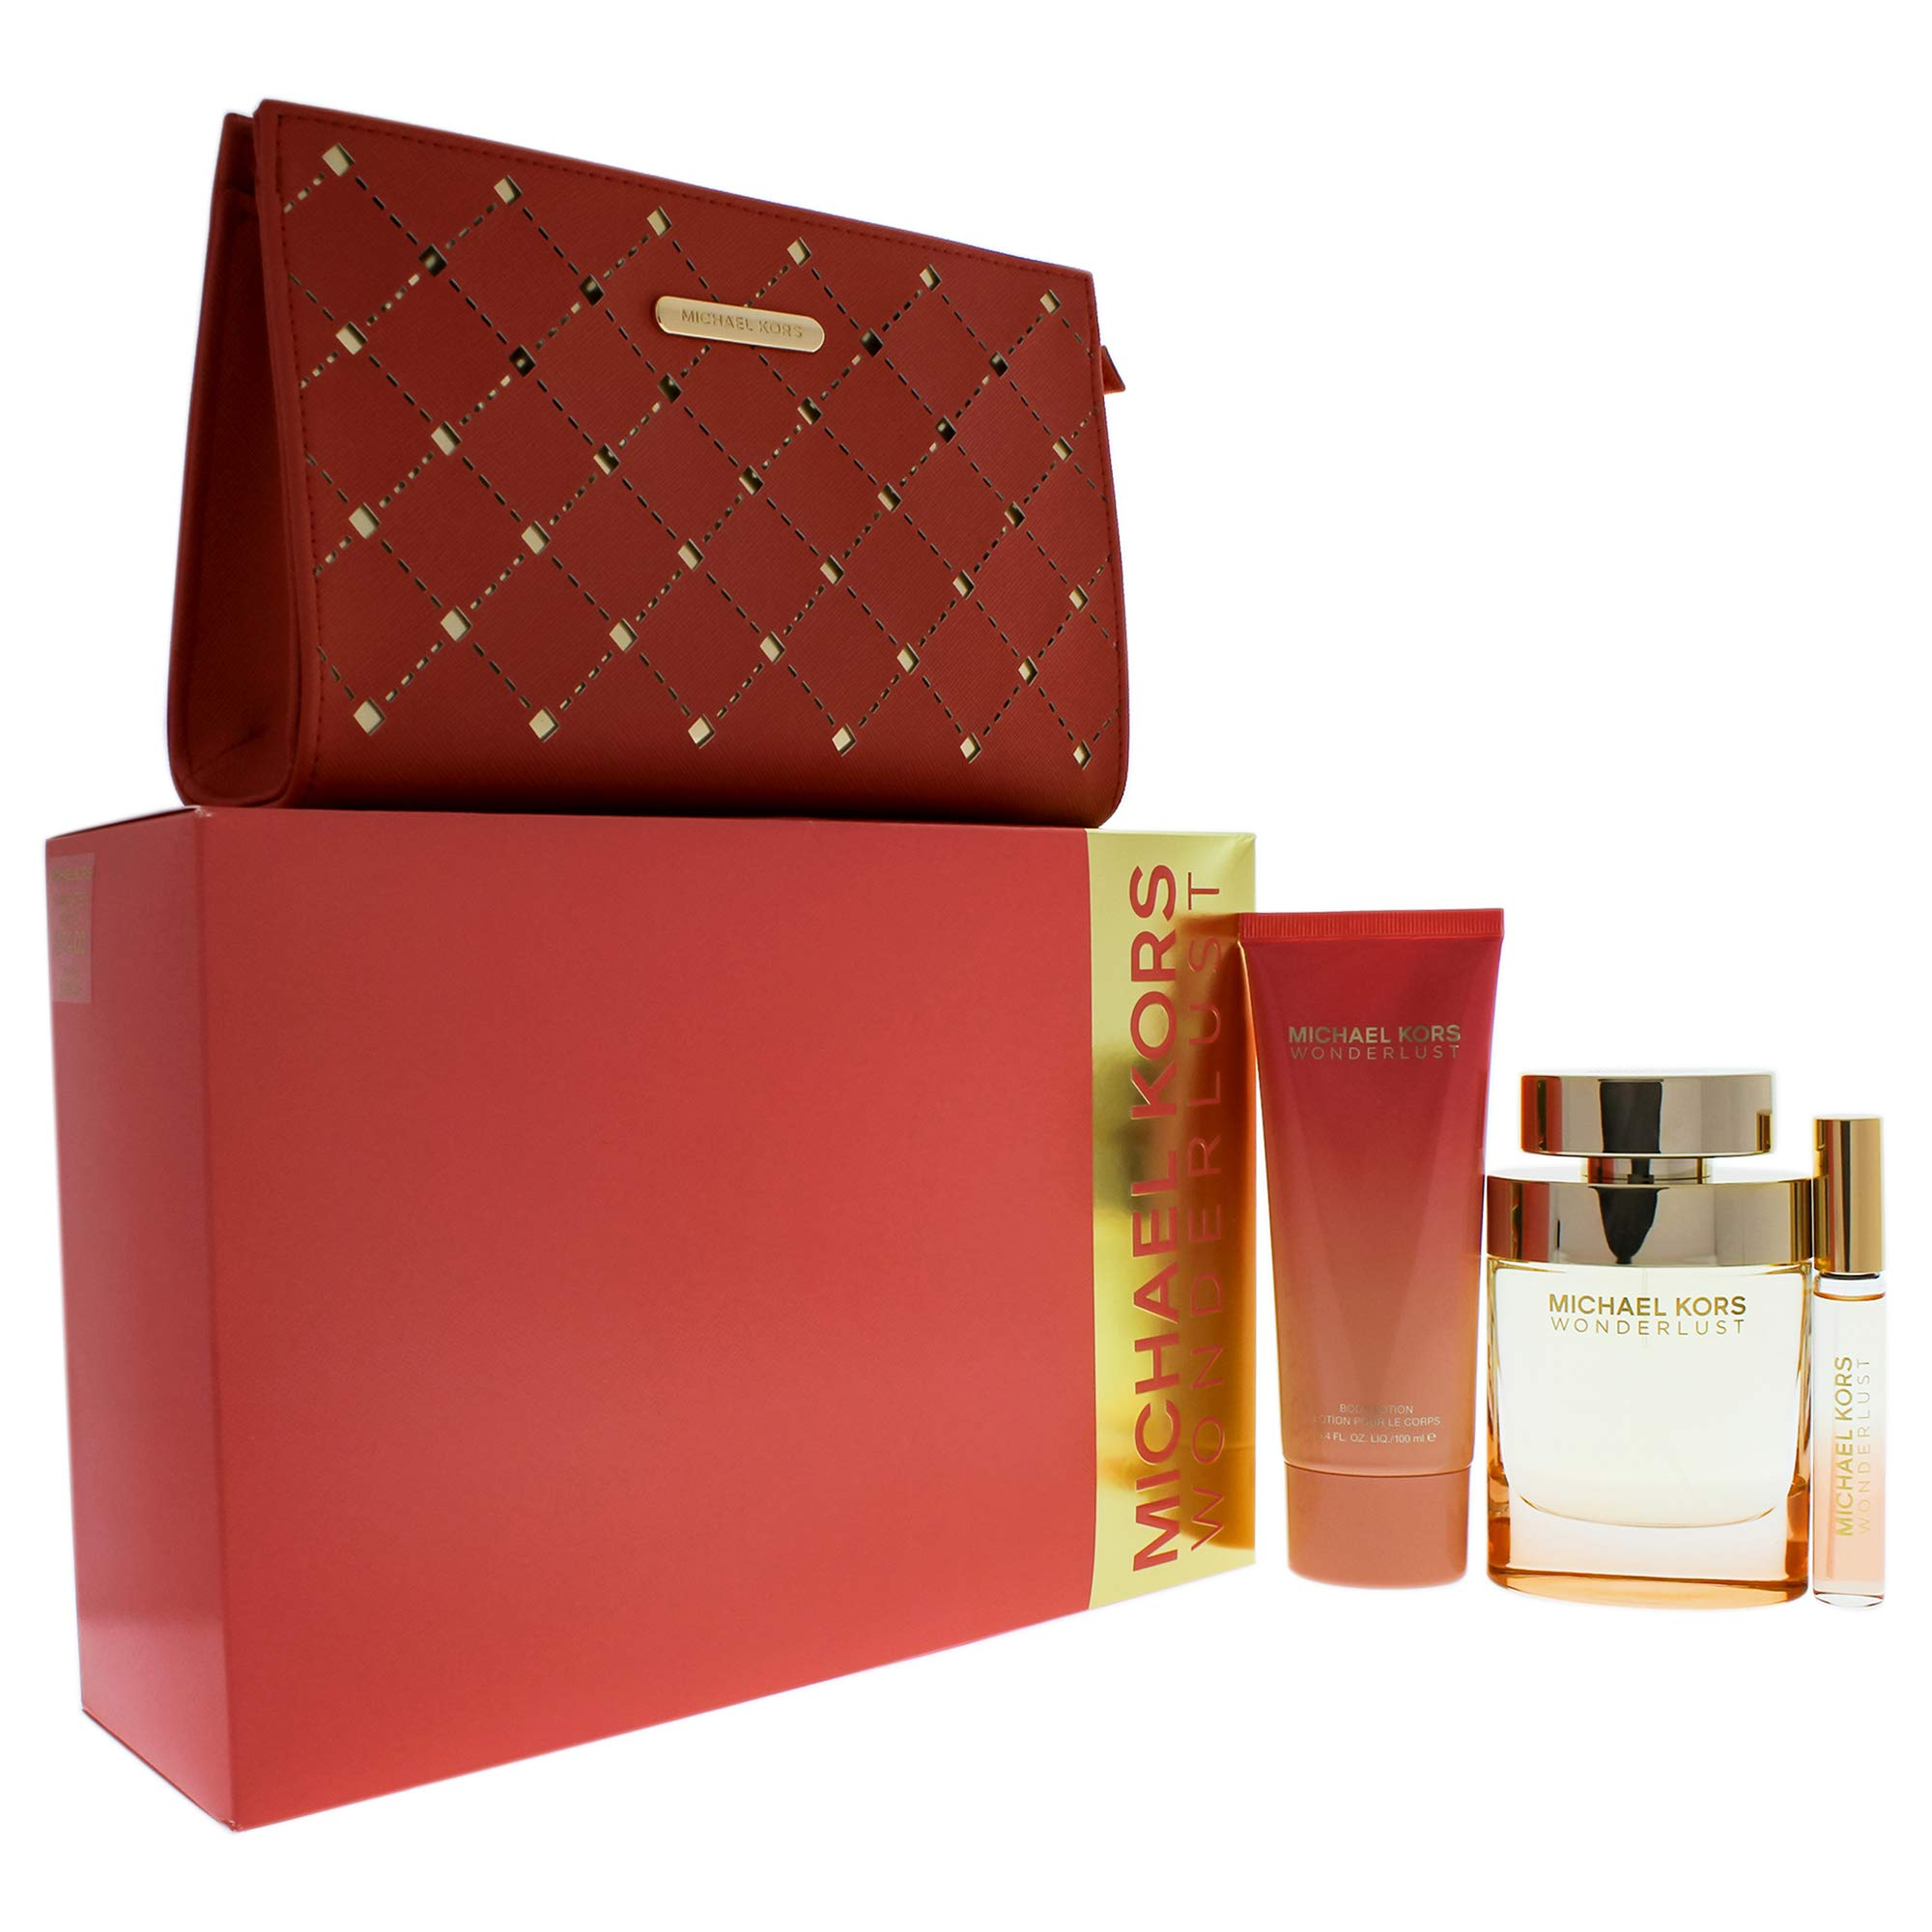 Michael Kors Wonderlust for Women 4 Piece Gift Set With Eau De Parfum Spray, Eau De Parfum Rollerball